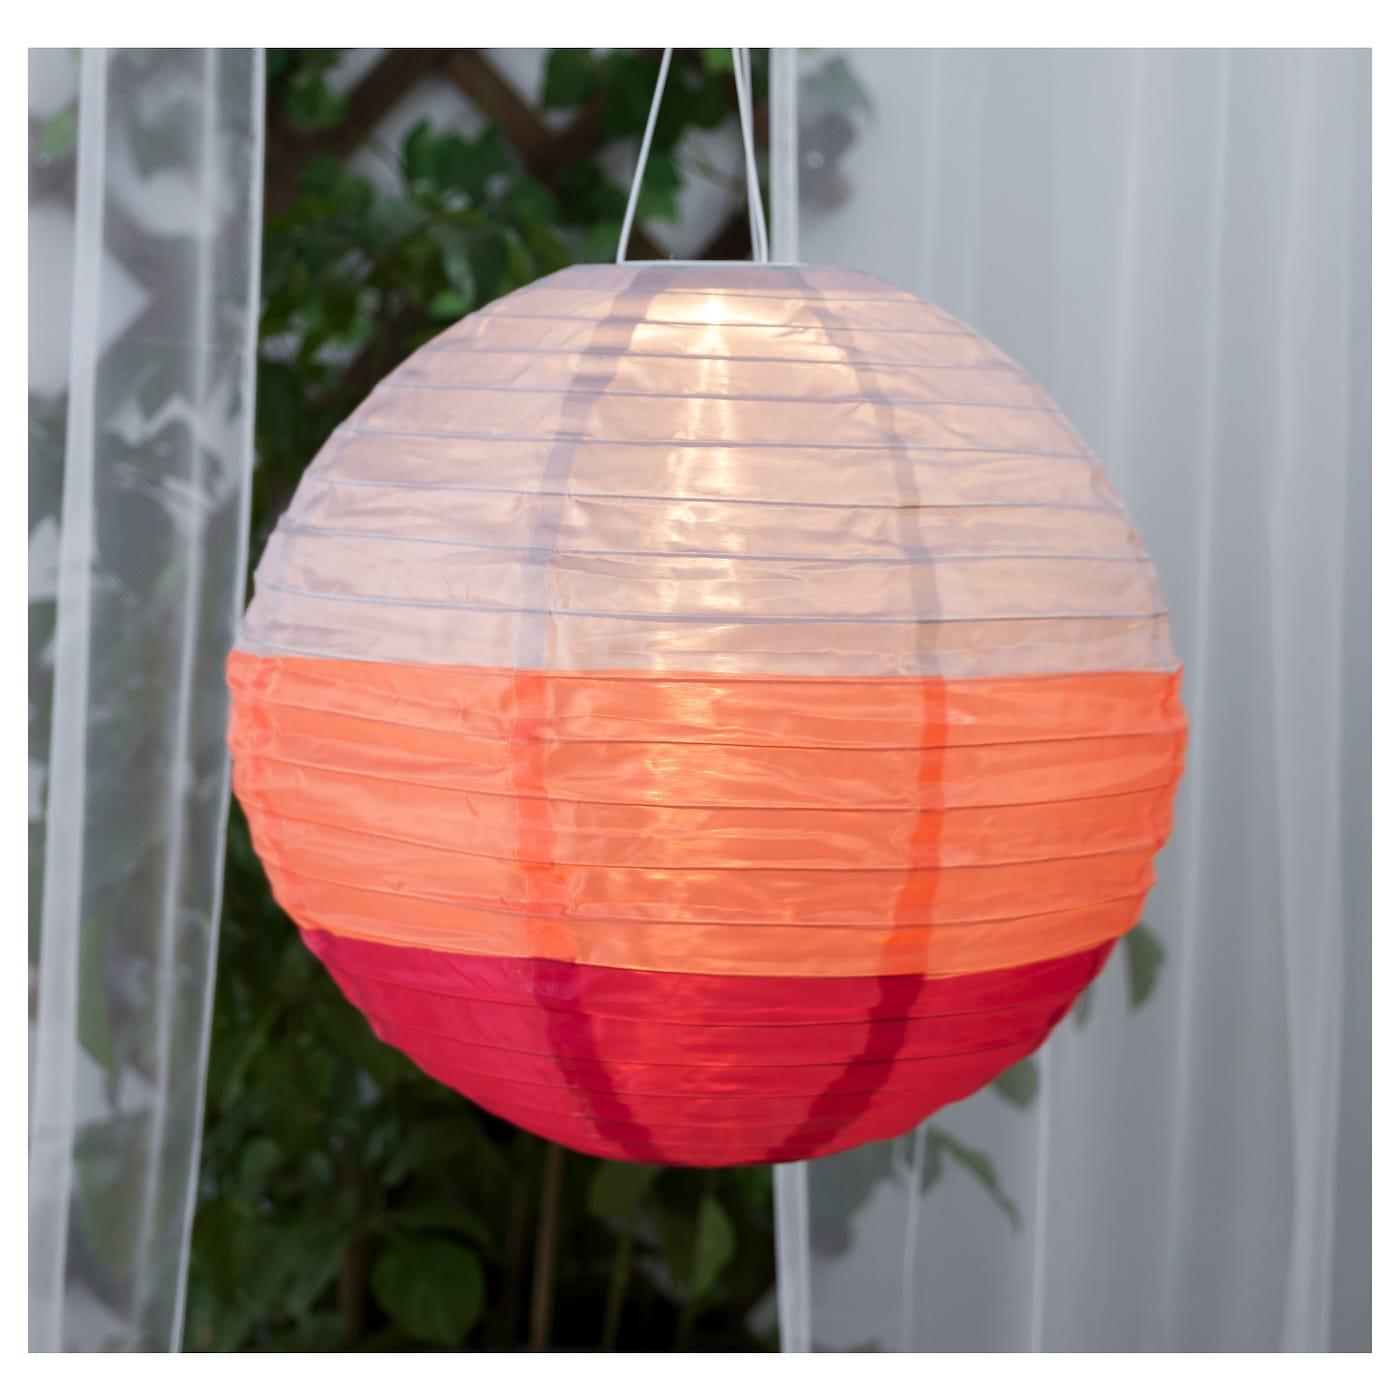 solvinden solar powered pendant lamp globe multicolour 45 cm ikea. Black Bedroom Furniture Sets. Home Design Ideas